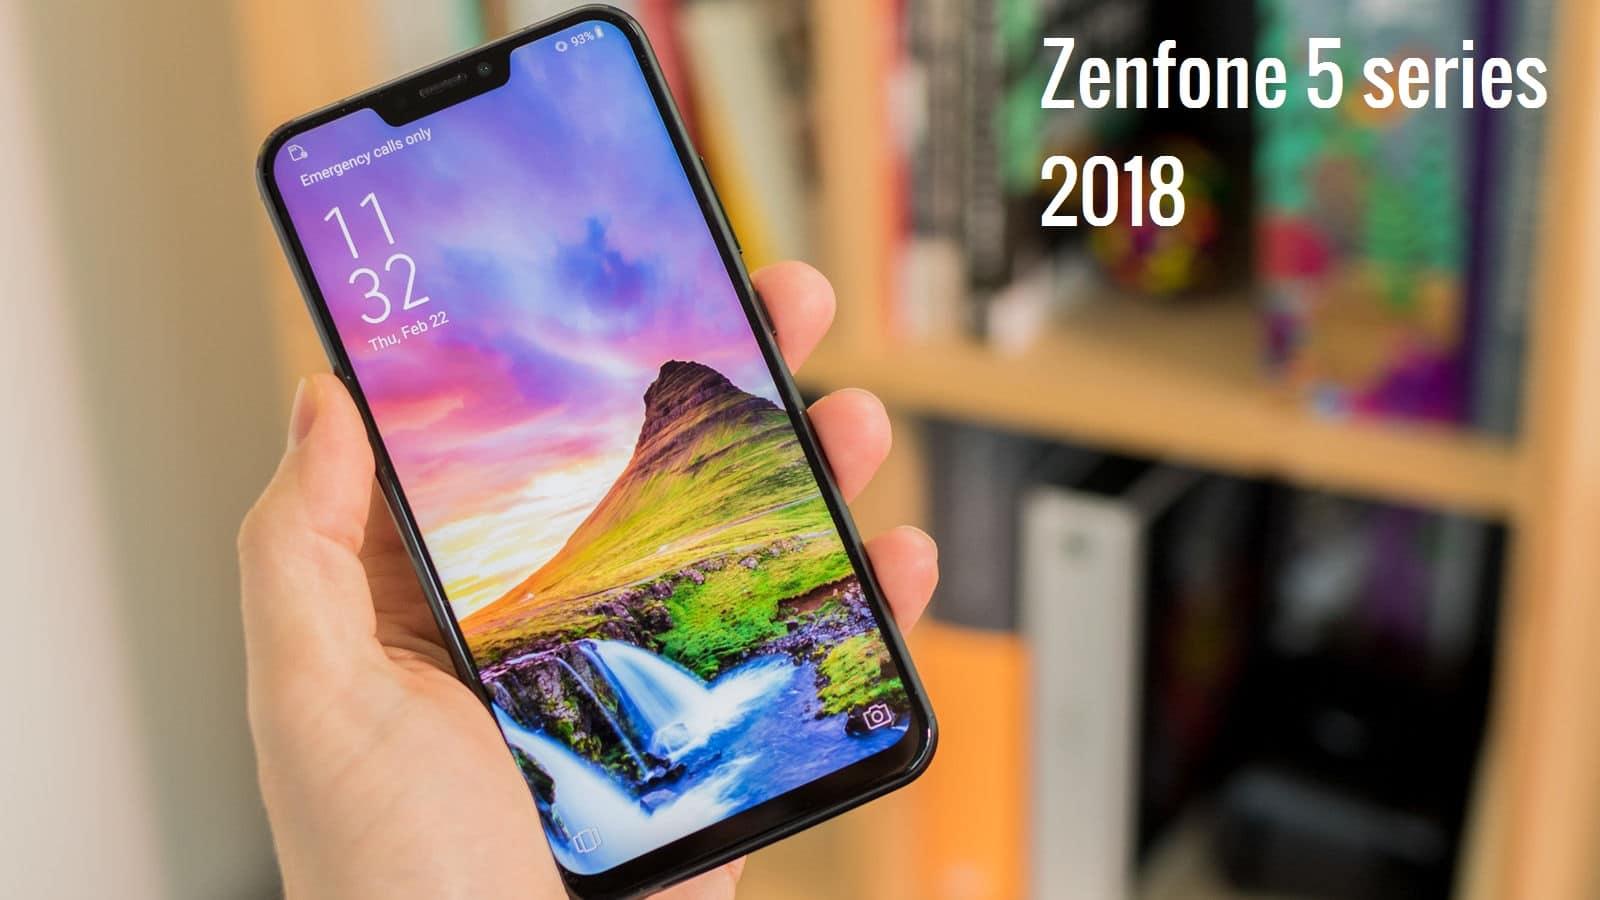 ZenFone 5 Is The Smartphone With Best Camera Mediator